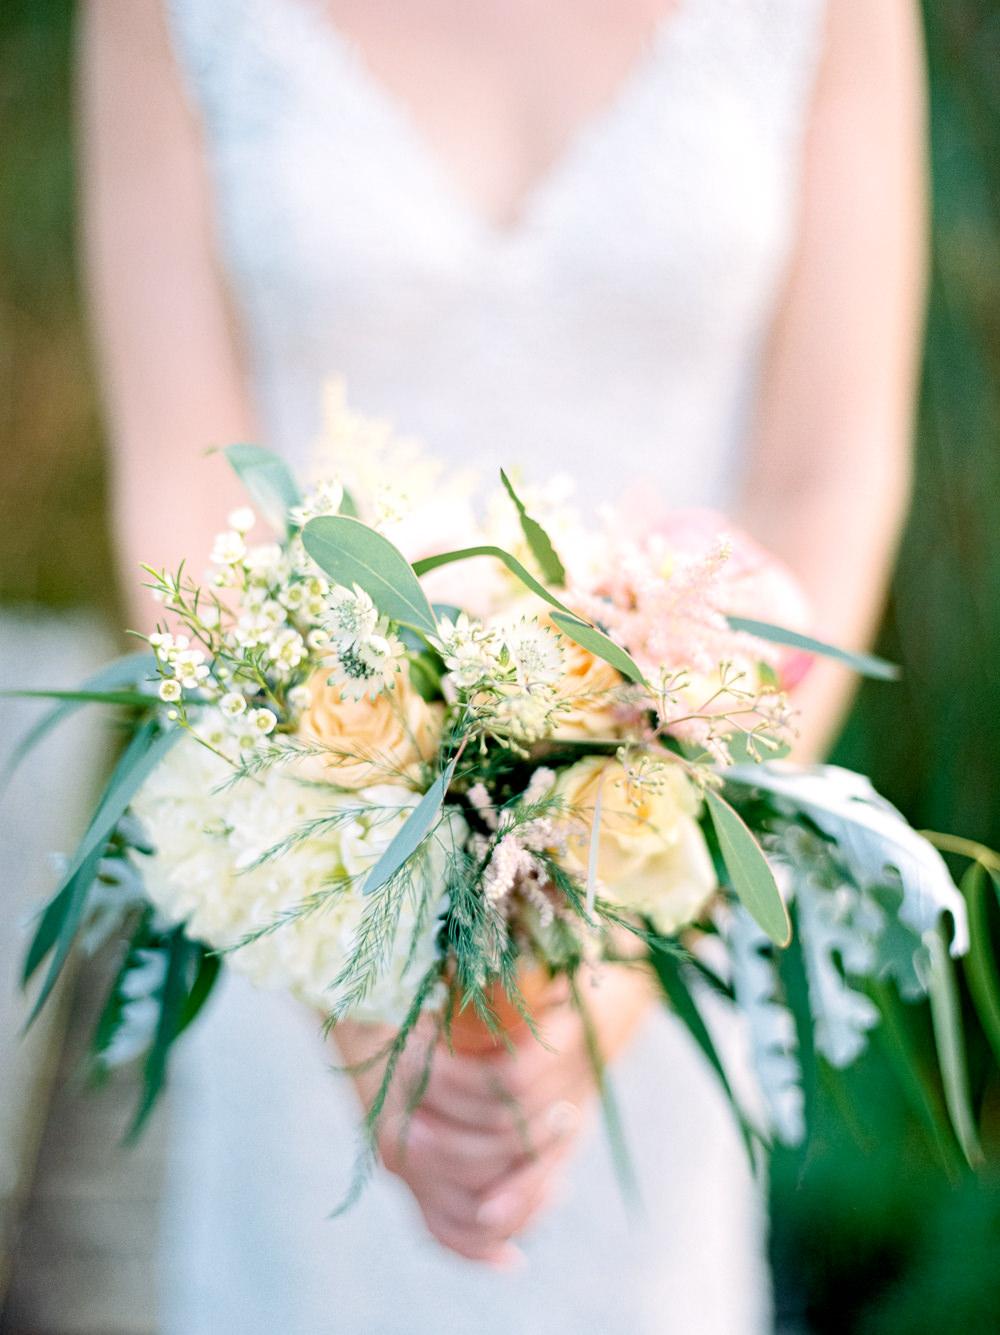 Bride Bridal Bouquet Greenery Rose Daisy Utopia Broughton Hall Wedding Christopher Thomas Photography